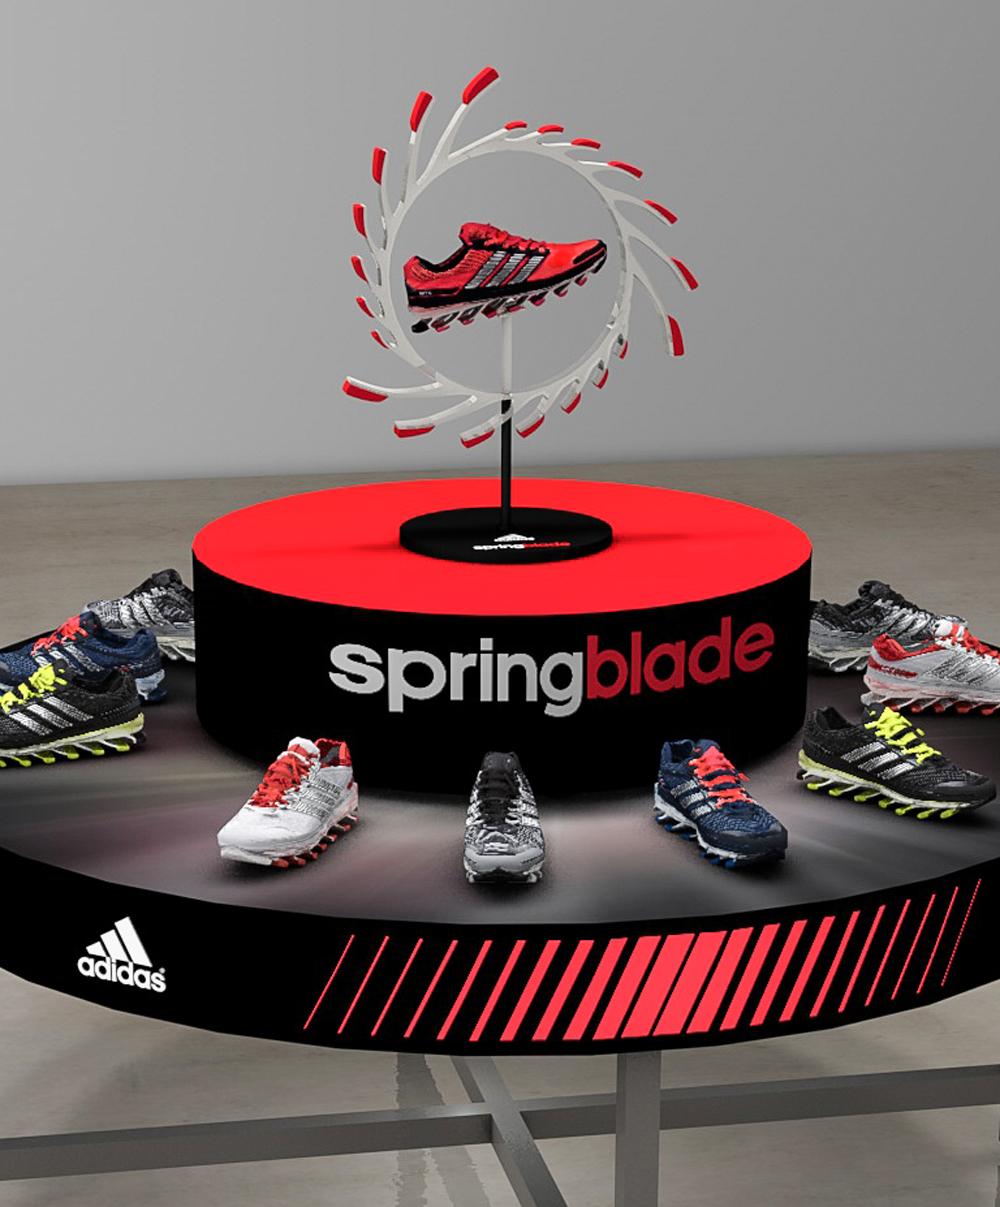 adidas Springblade shoe table highlight render